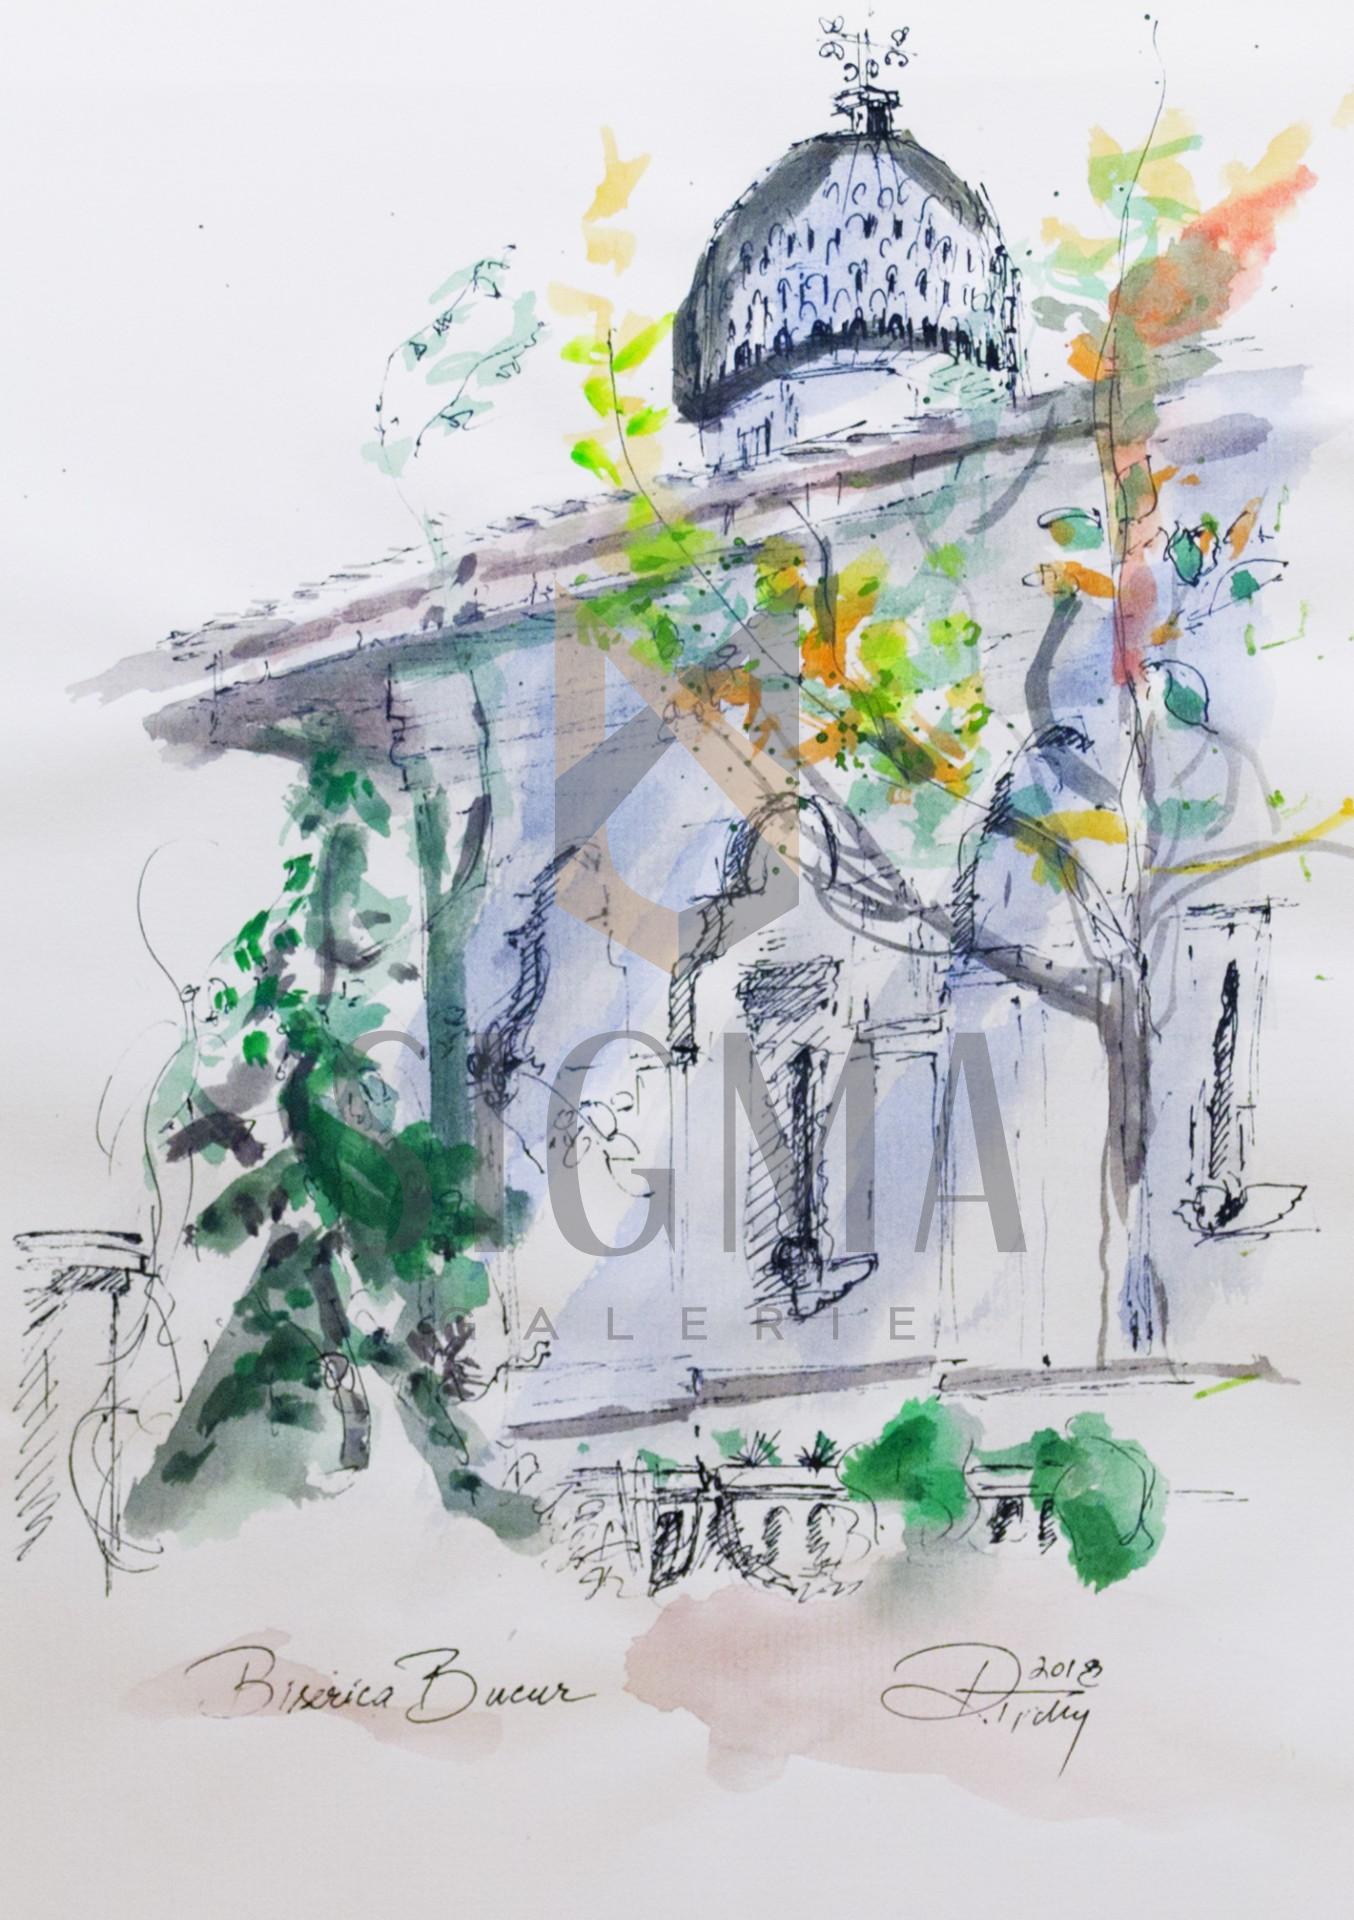 Tablou, Rodica Tichindelean - Biserica Bucur - acuarela si tus, 30x21 cm